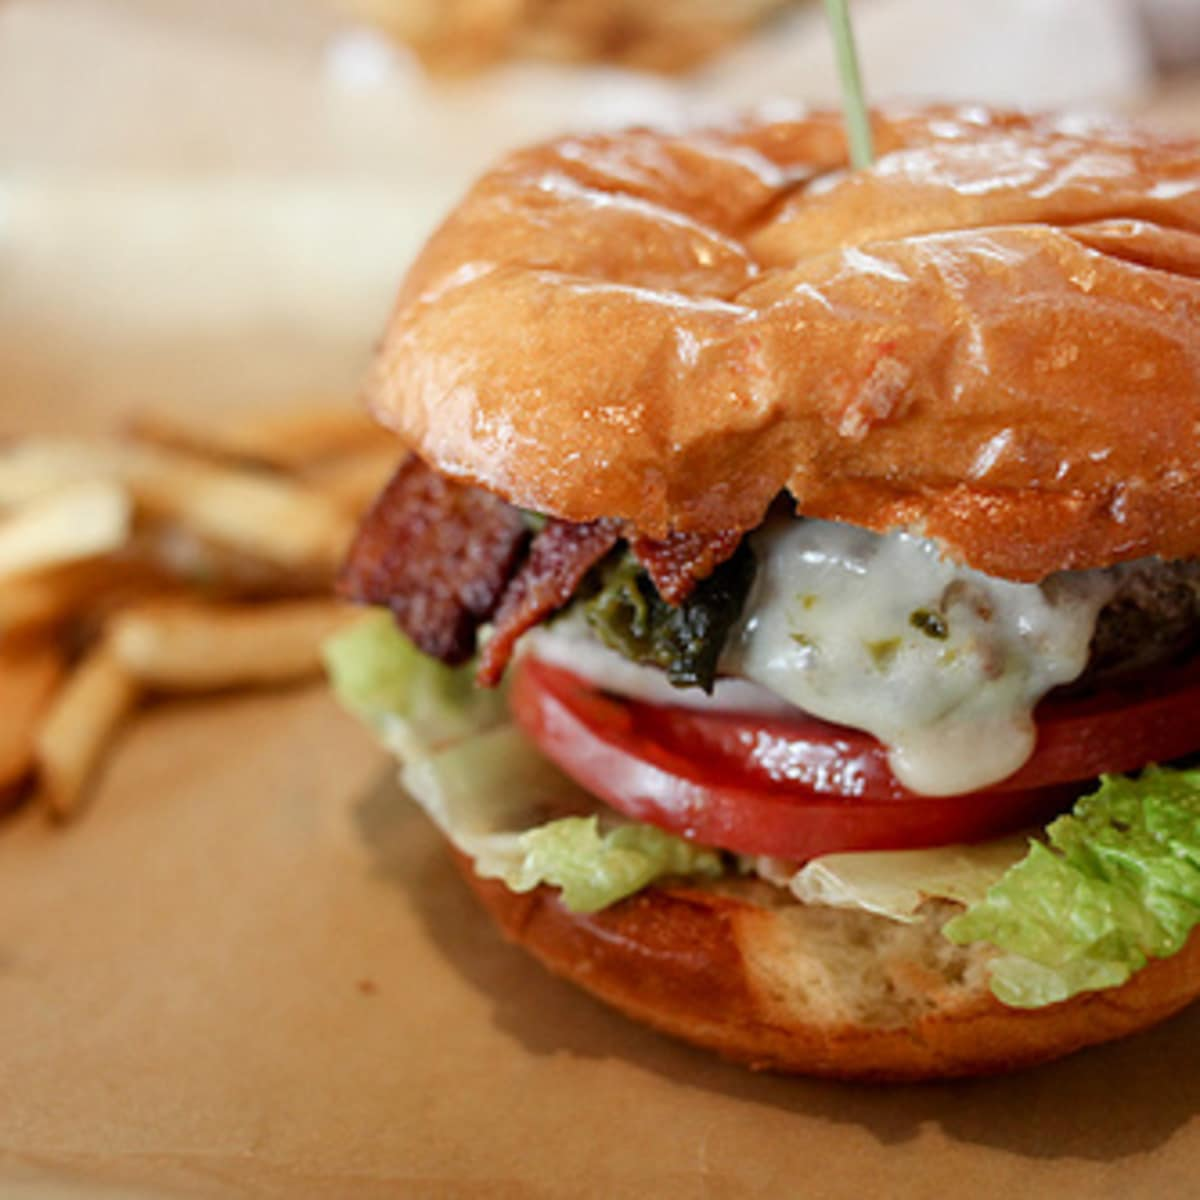 California Pizza Kitchen Dallas: Best Neighborhood Eats: 6 Hot Restaurants In Preston